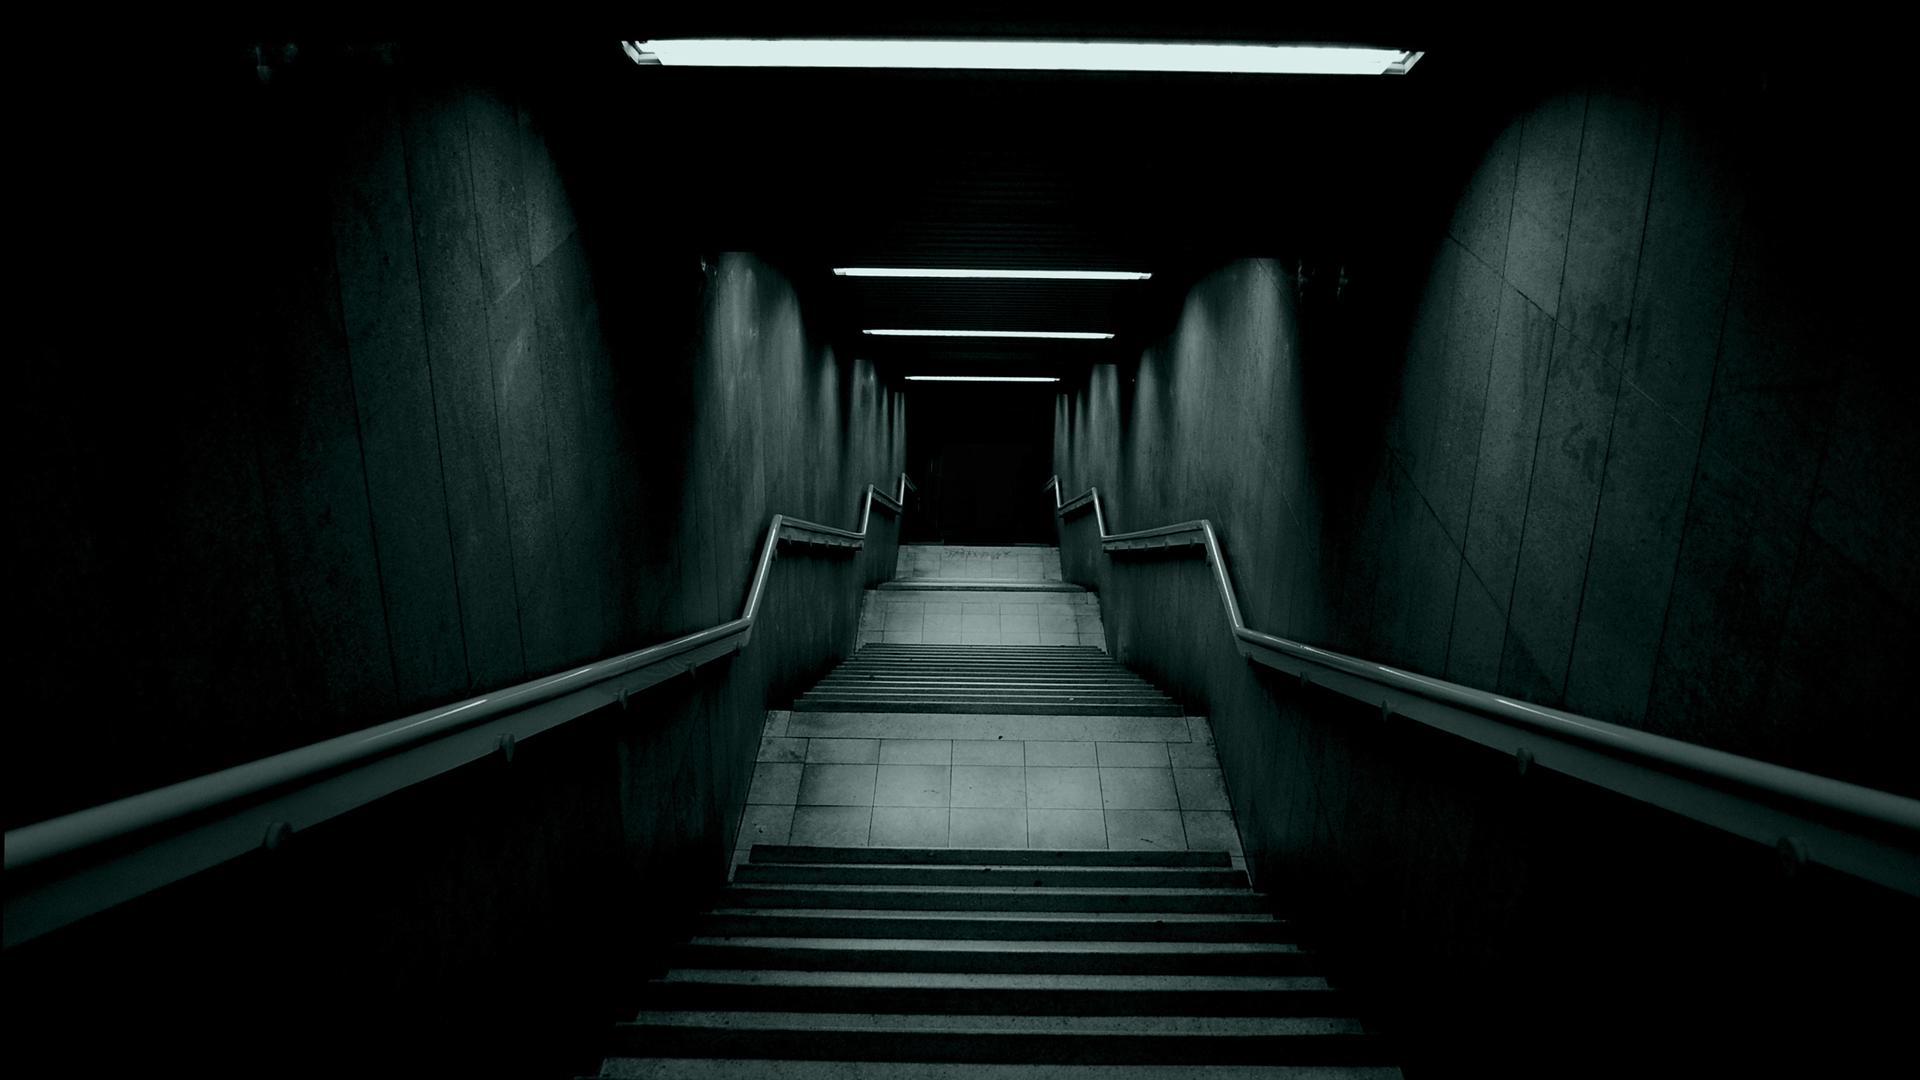 Hd wallpaper darkness - Best Dark Wallpapers Hd 42 Wallpapers